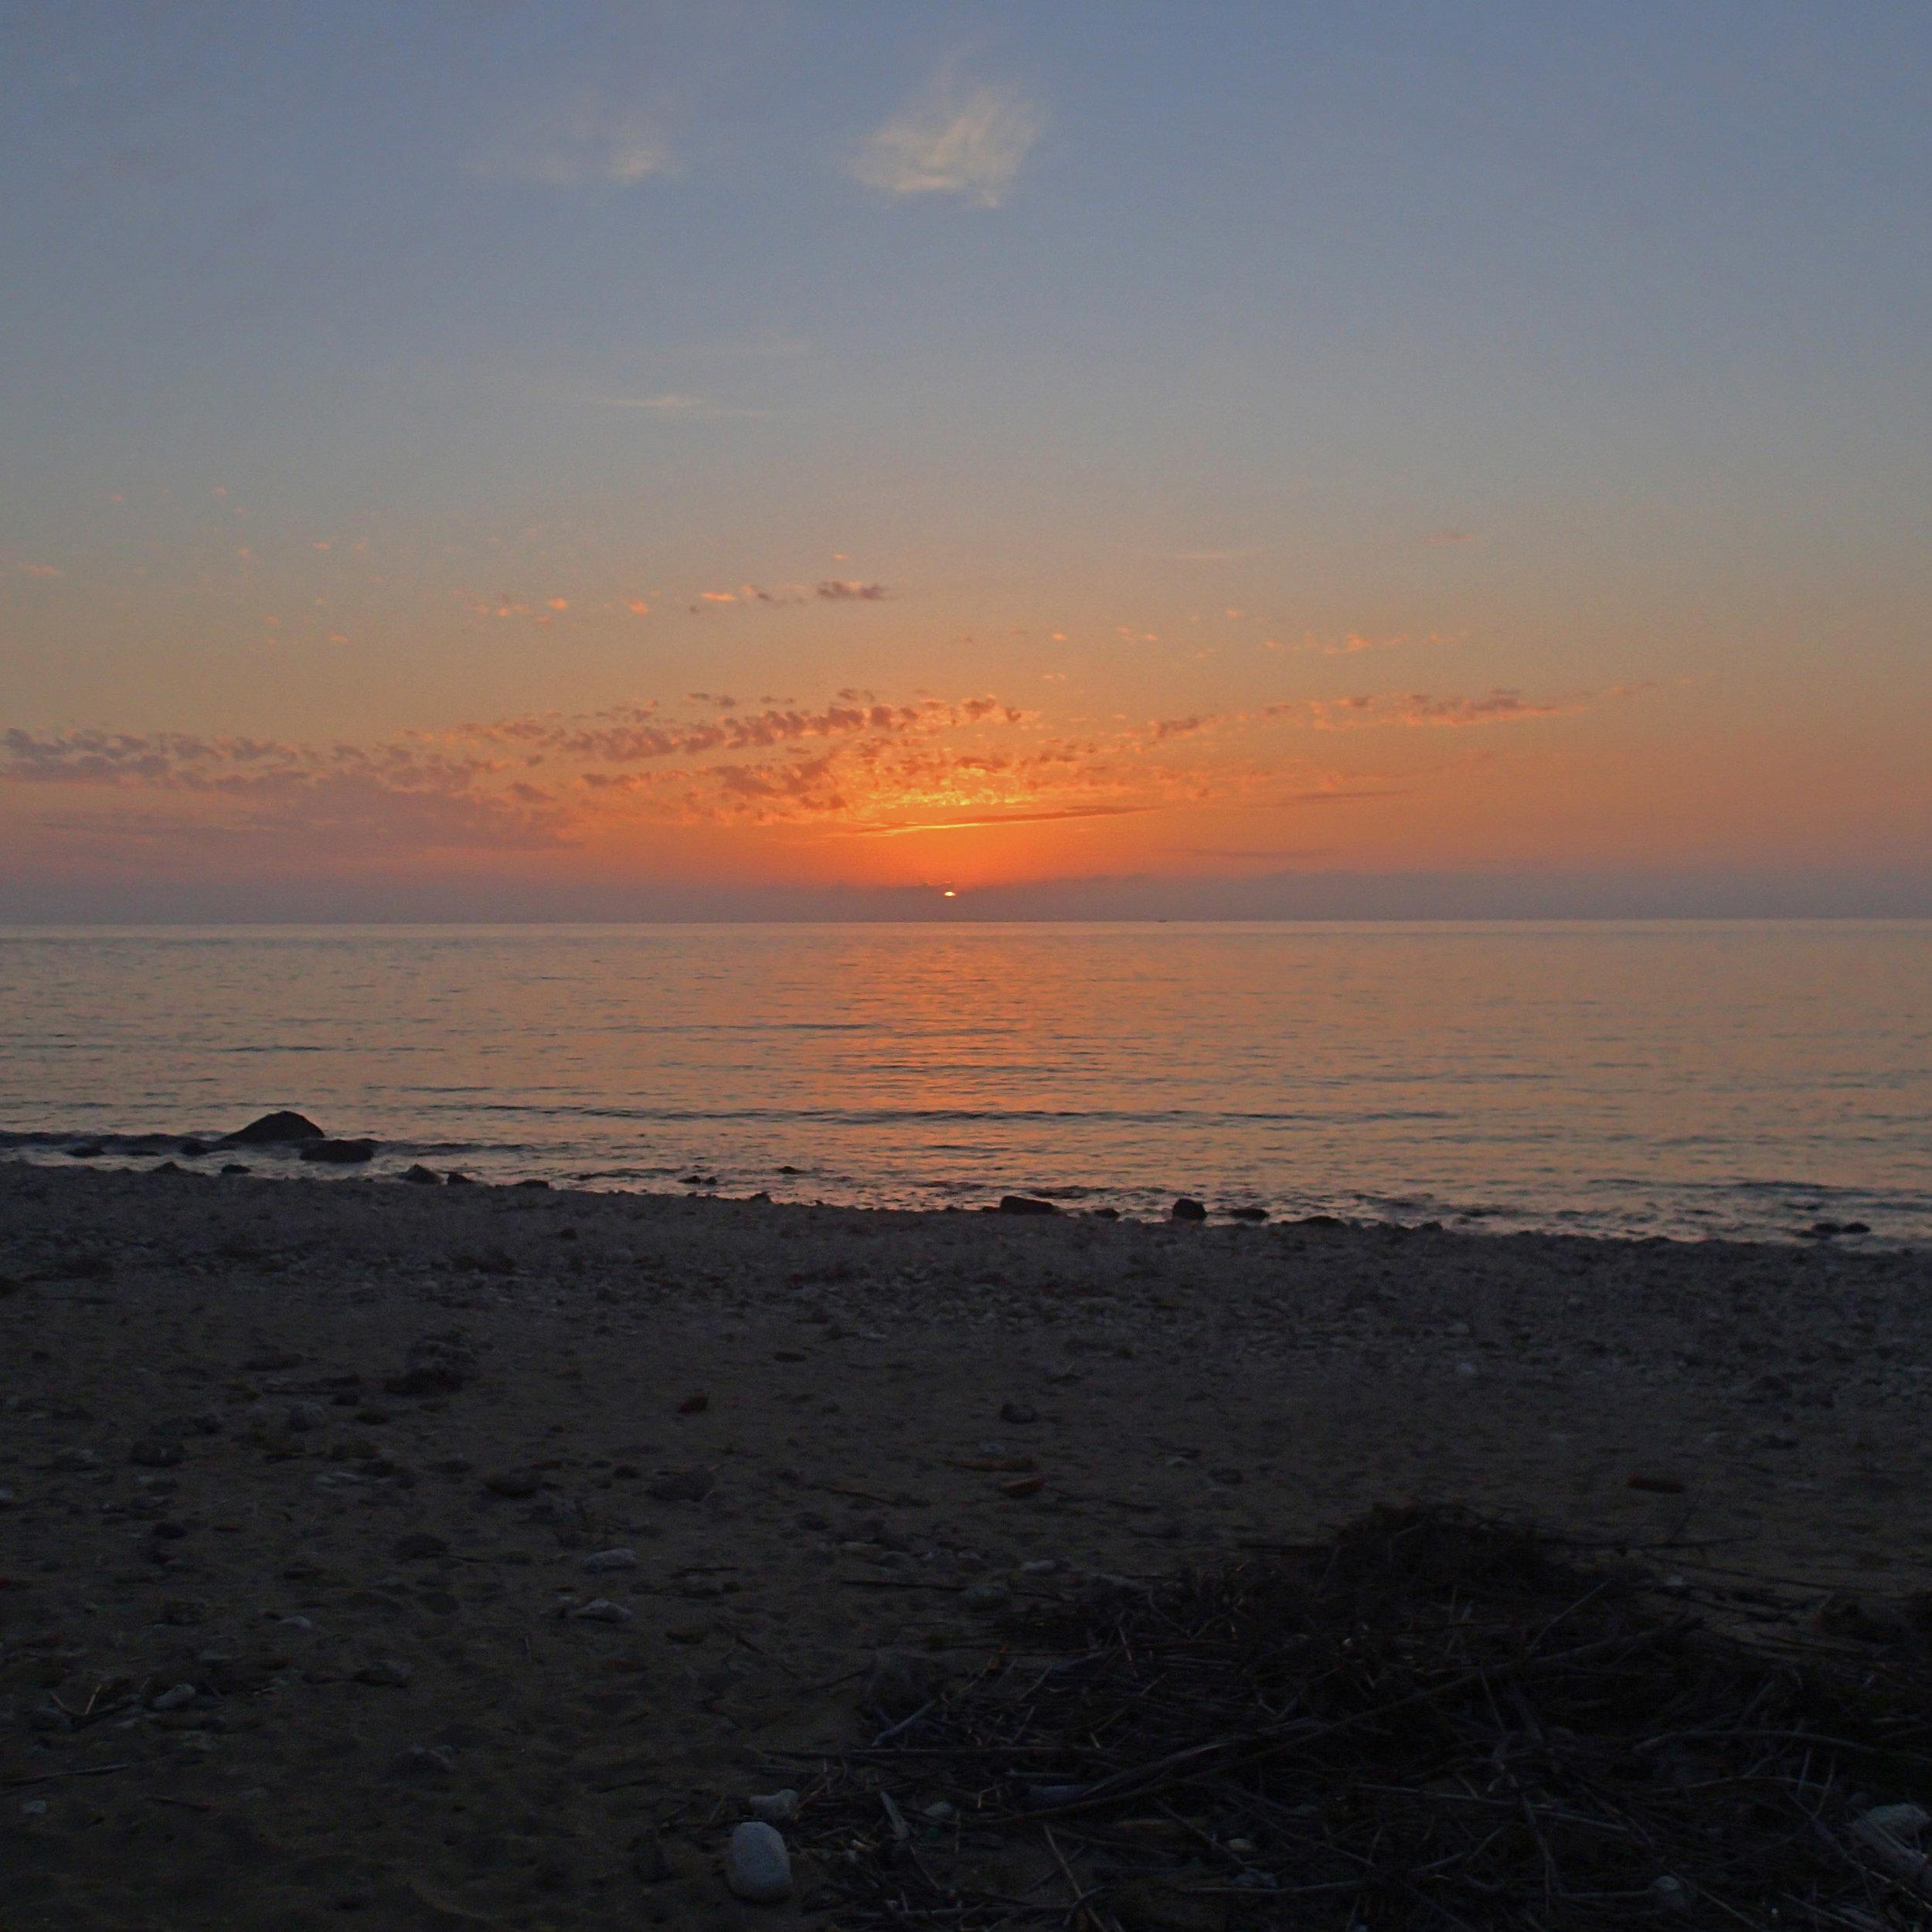 2016-4-7 sunset.jpg